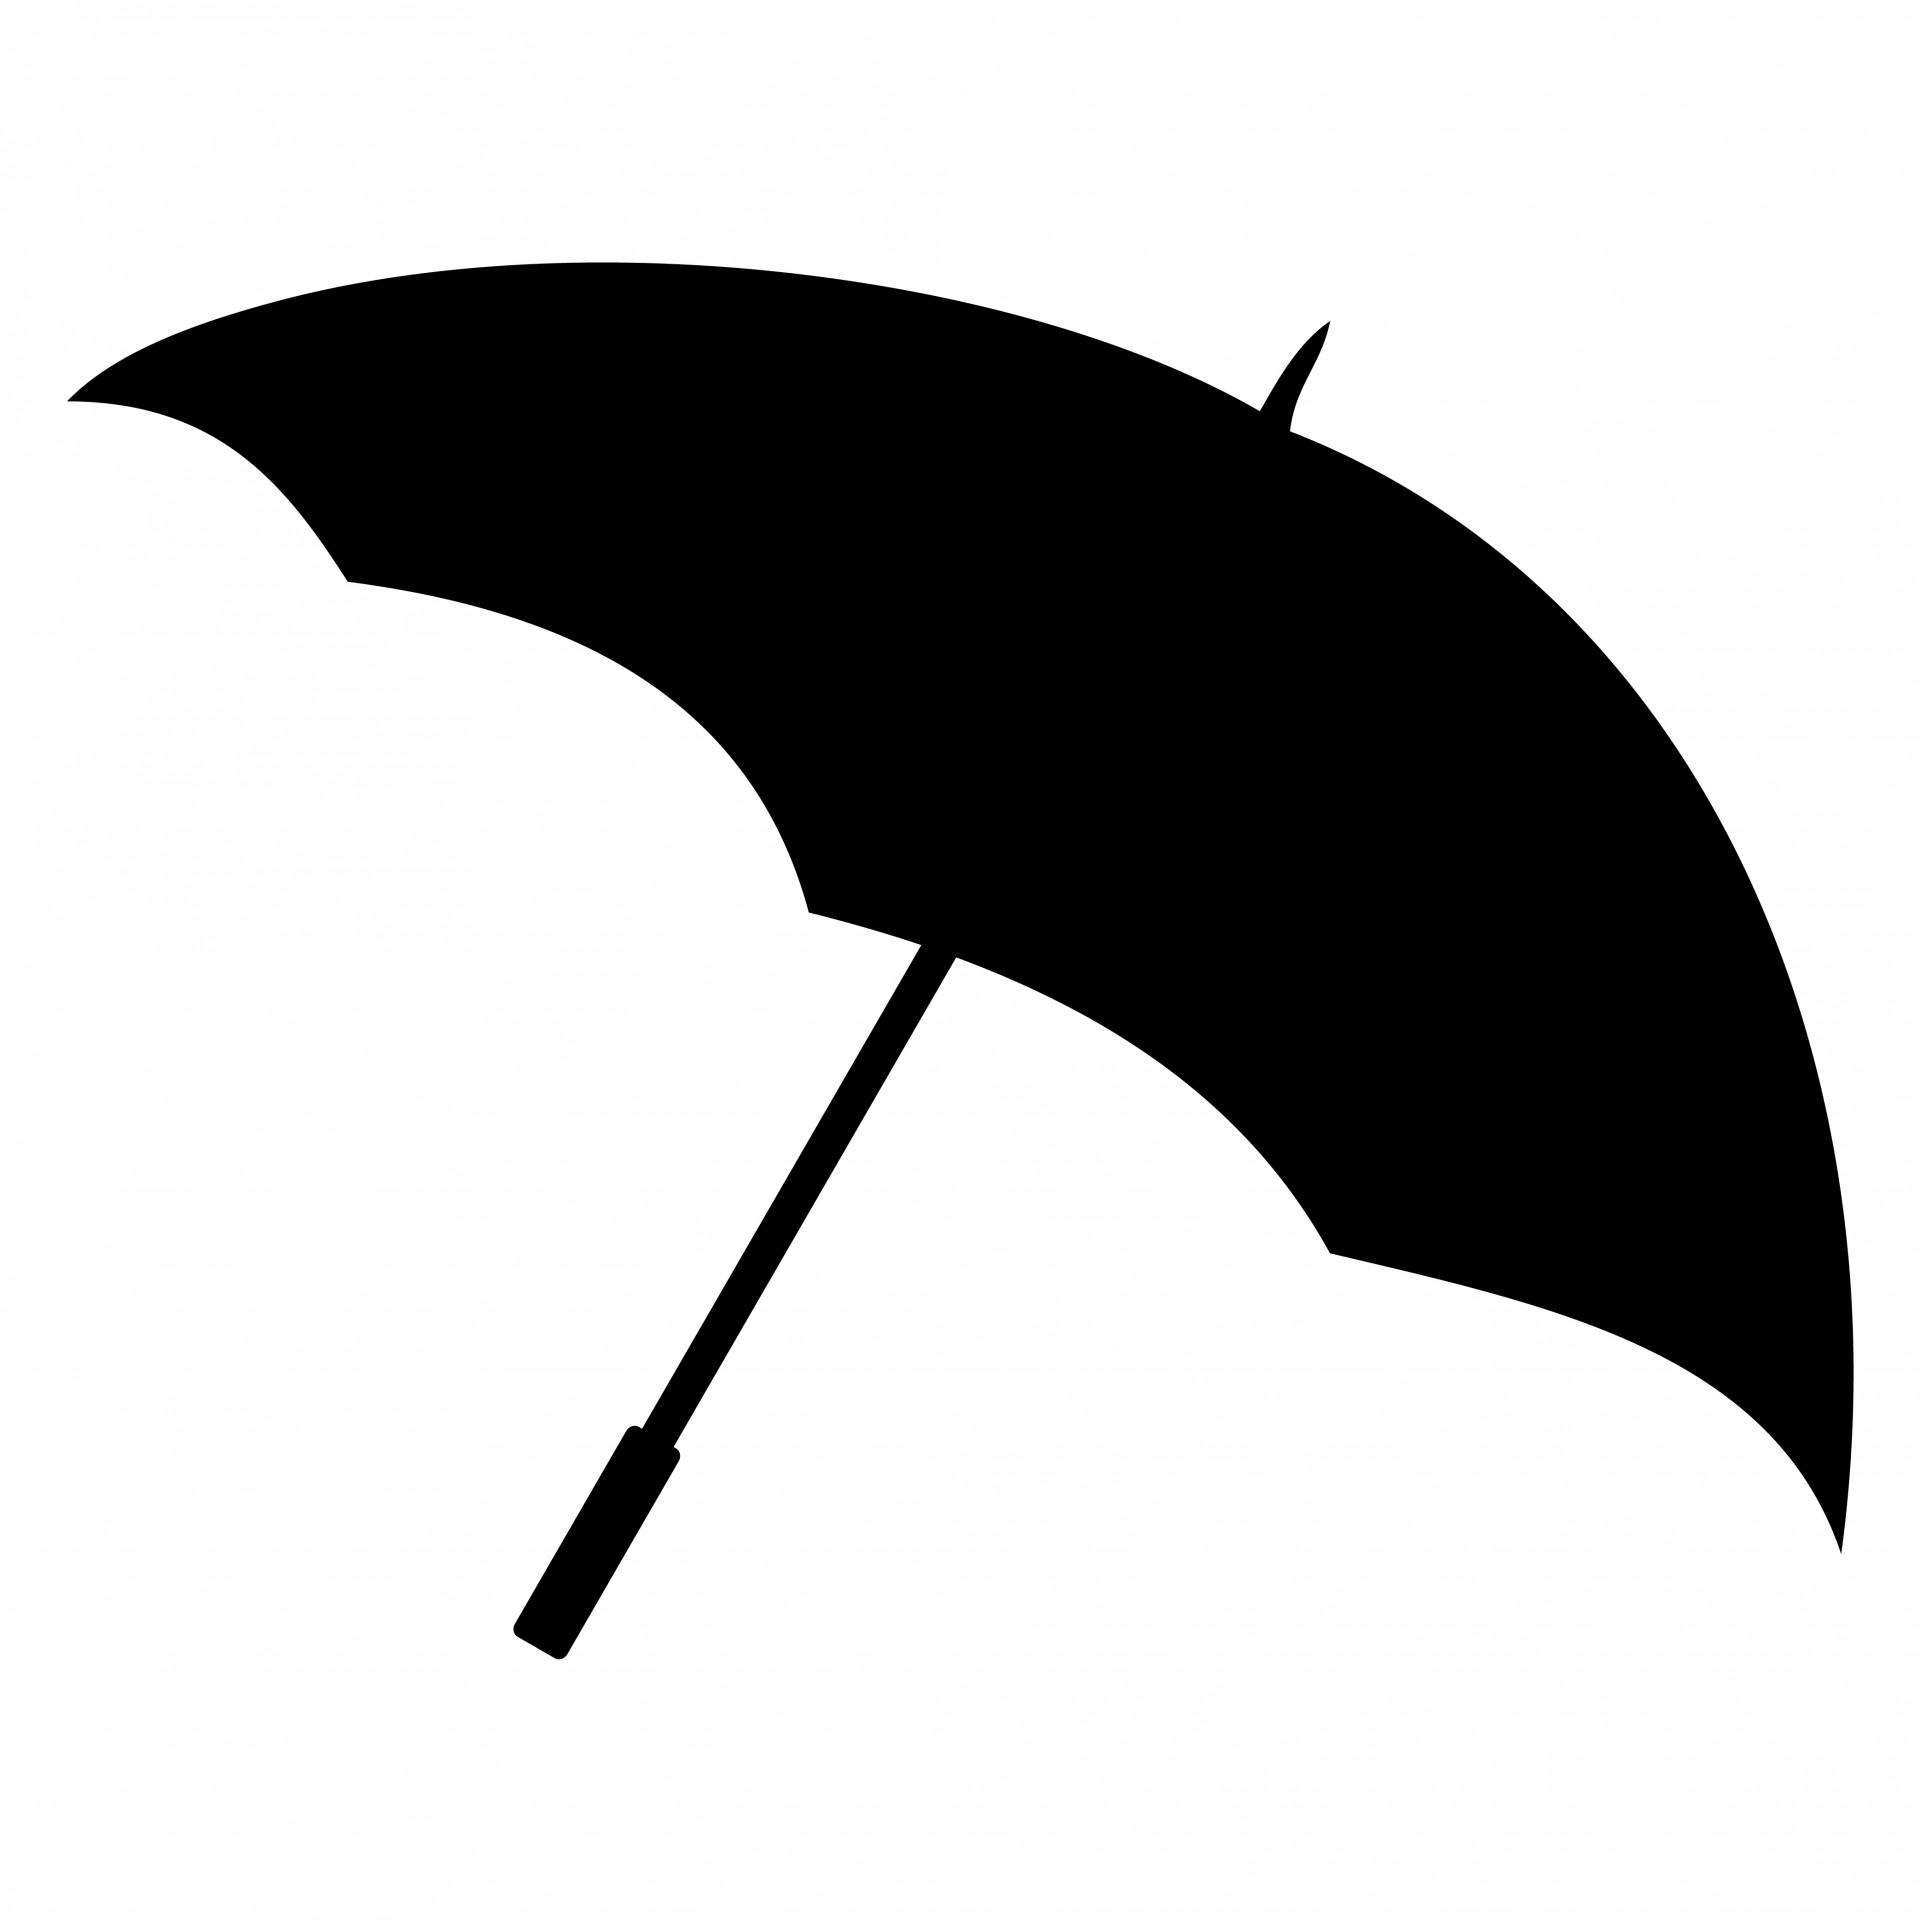 Covered clipart umbrella Photo Clipart Umbrella Stock Free